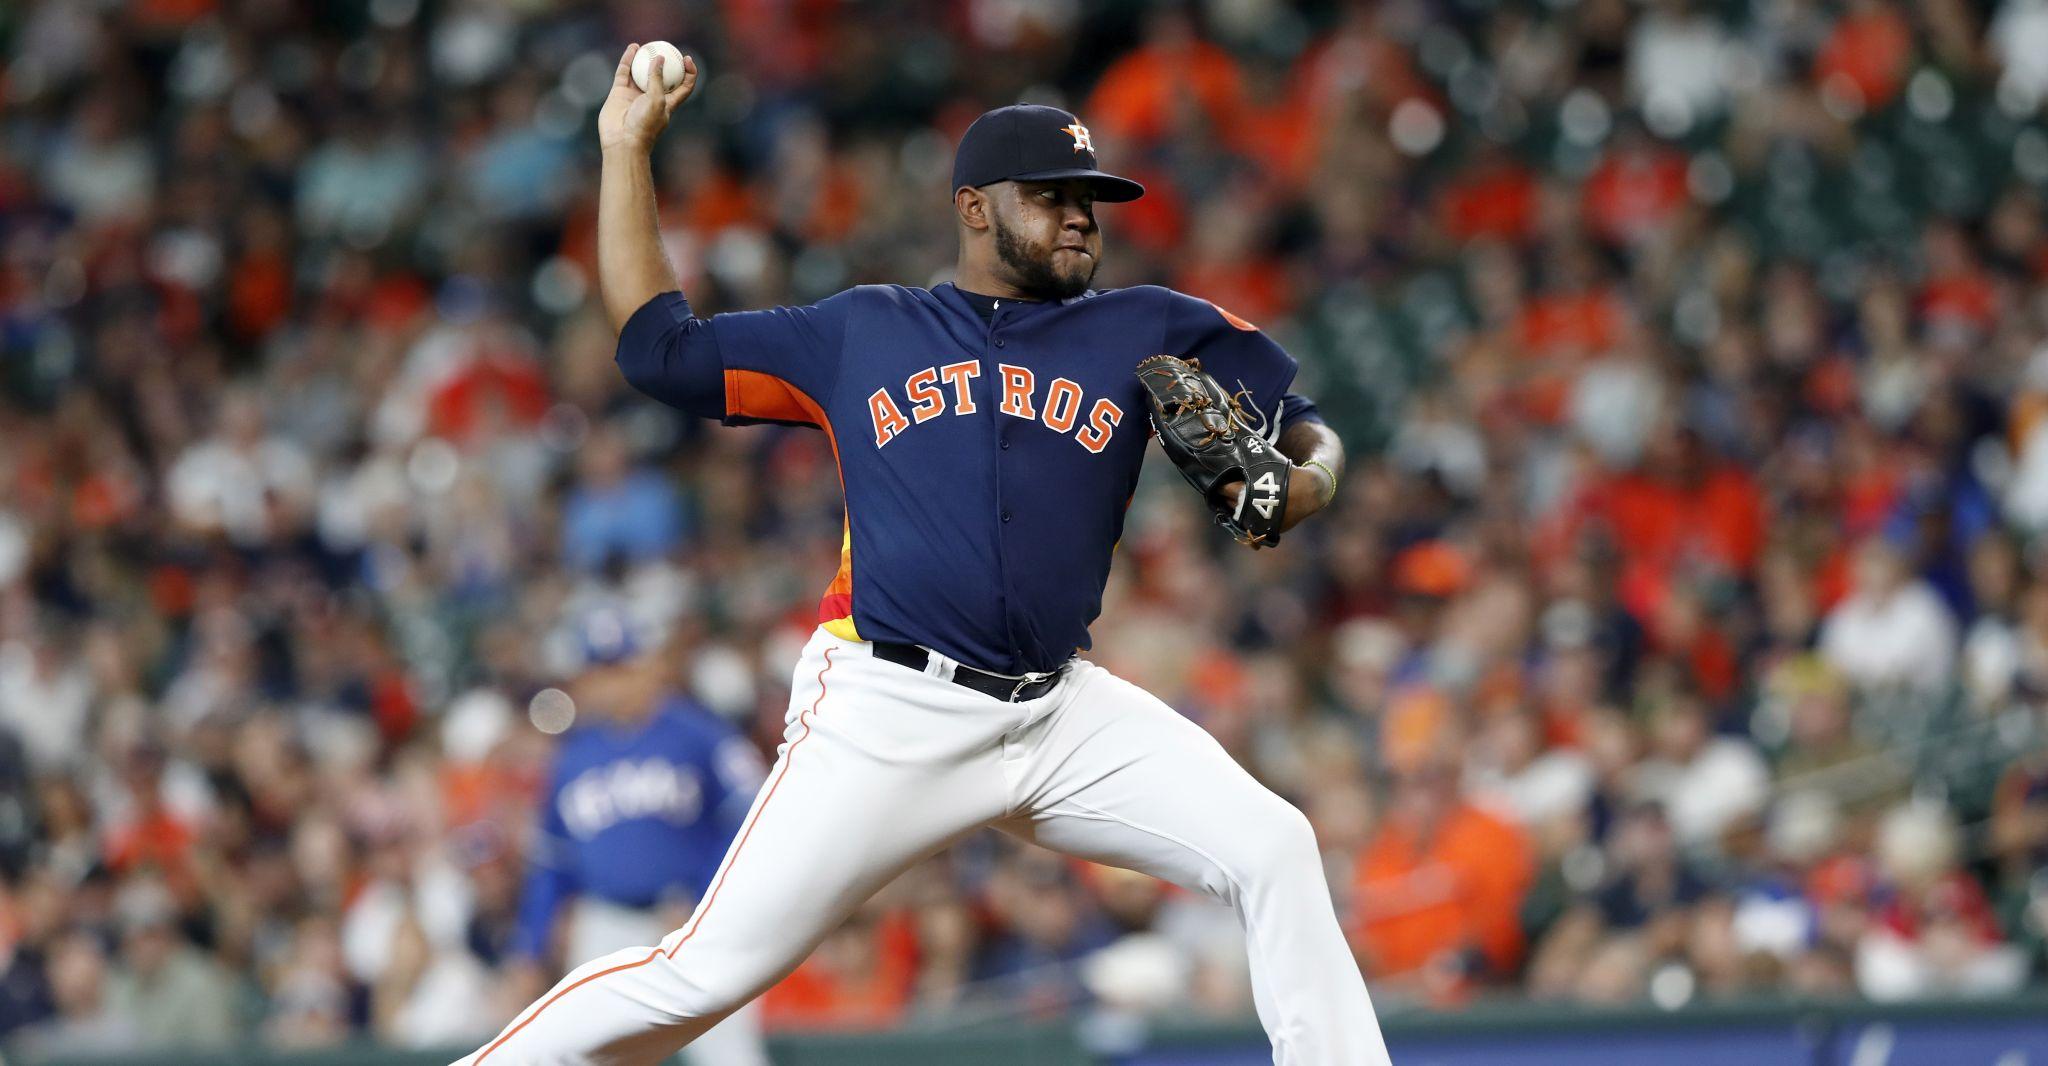 Astros' Saturday starter still to be determined